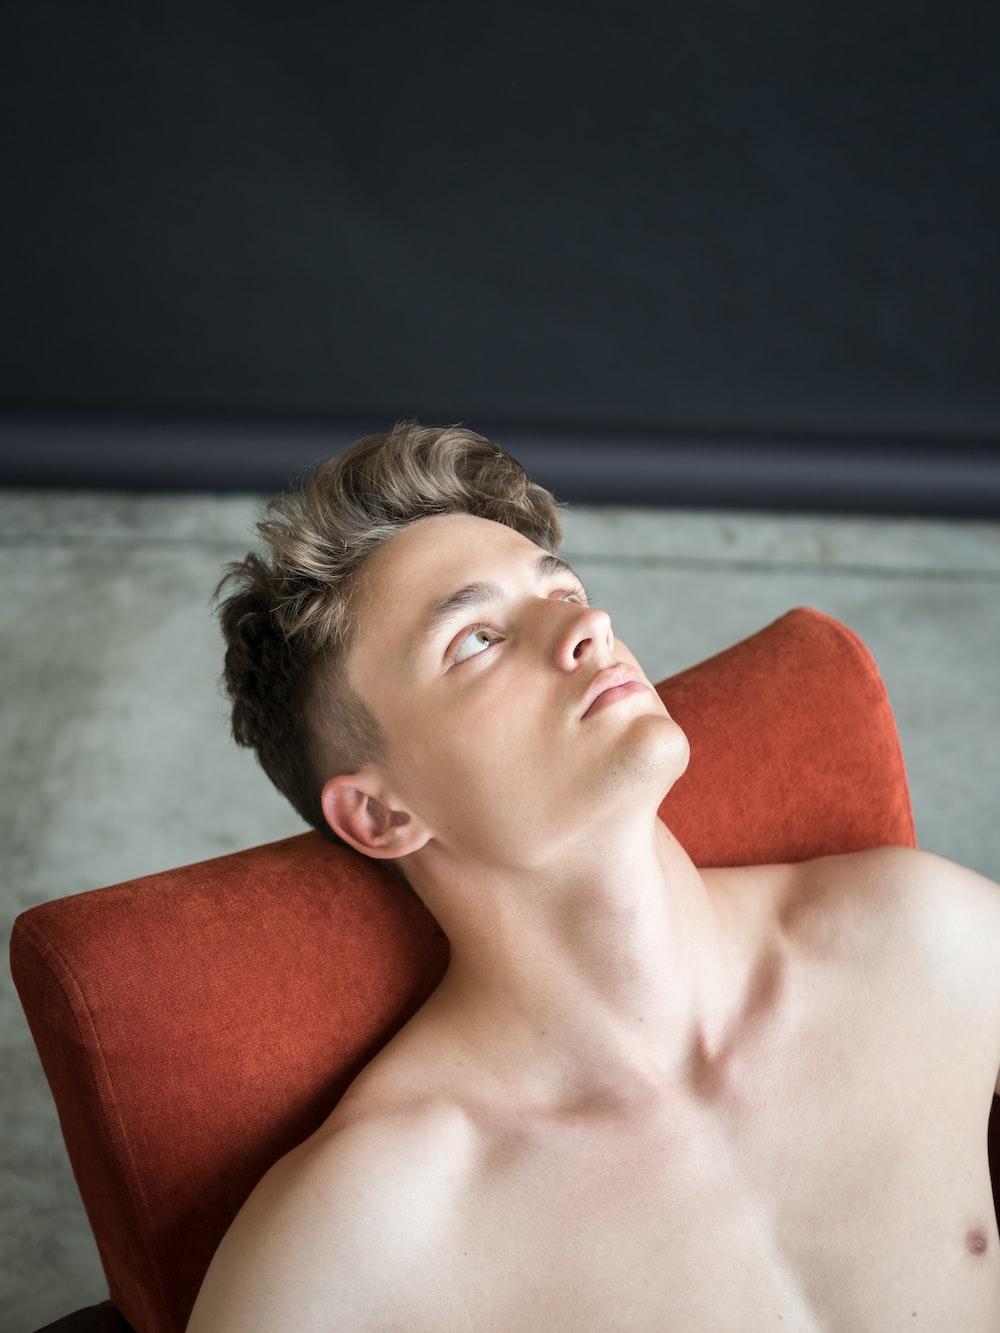 topless man lying on red sofa